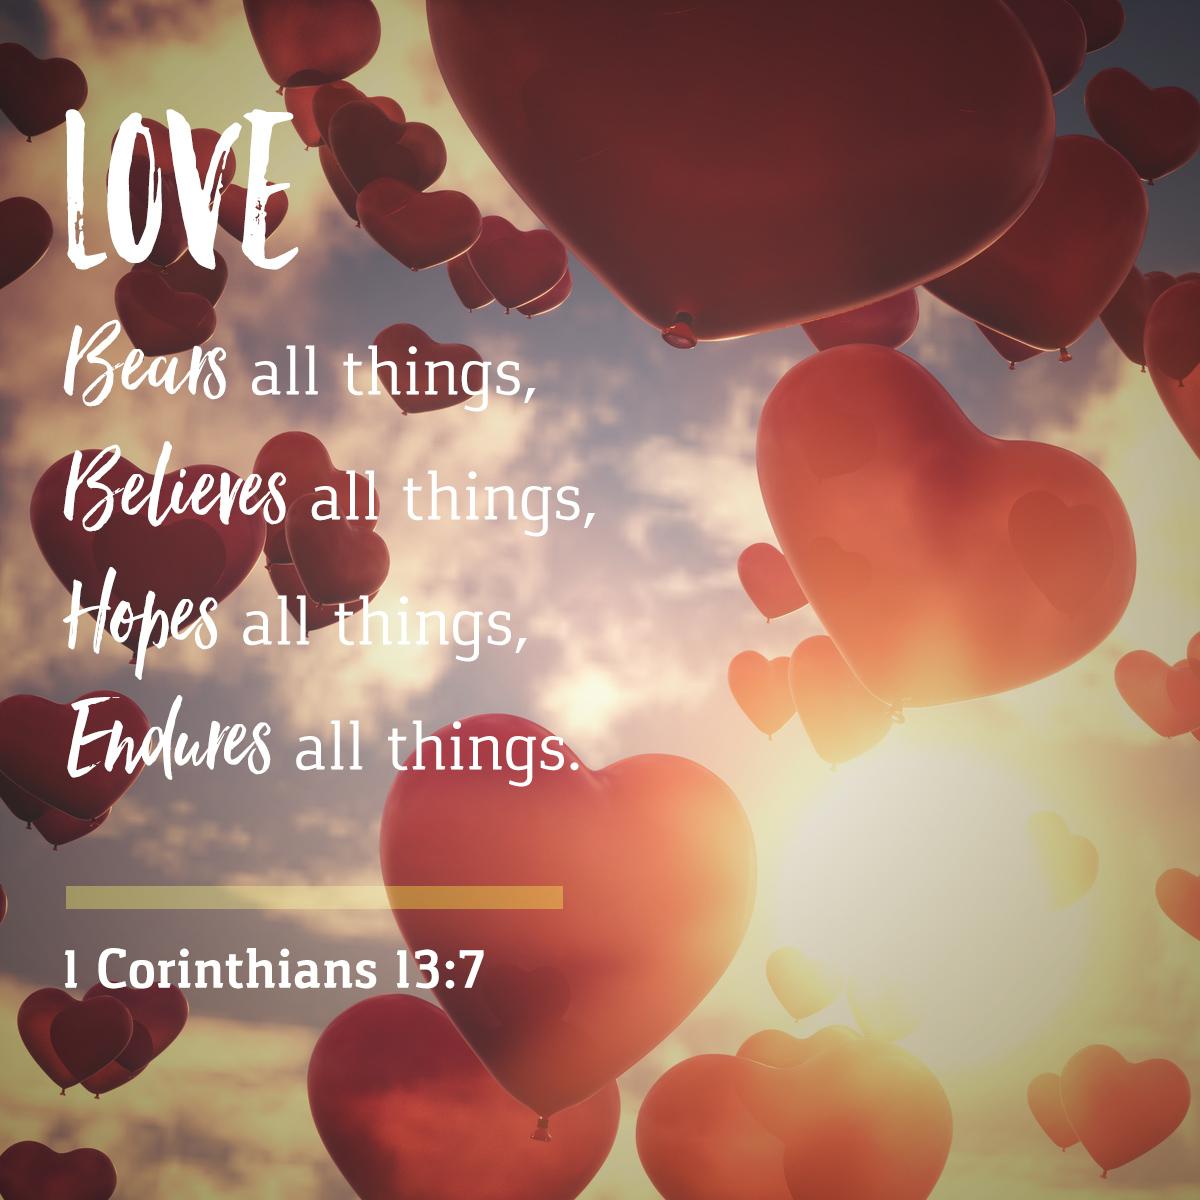 1 Corinthians 13:7